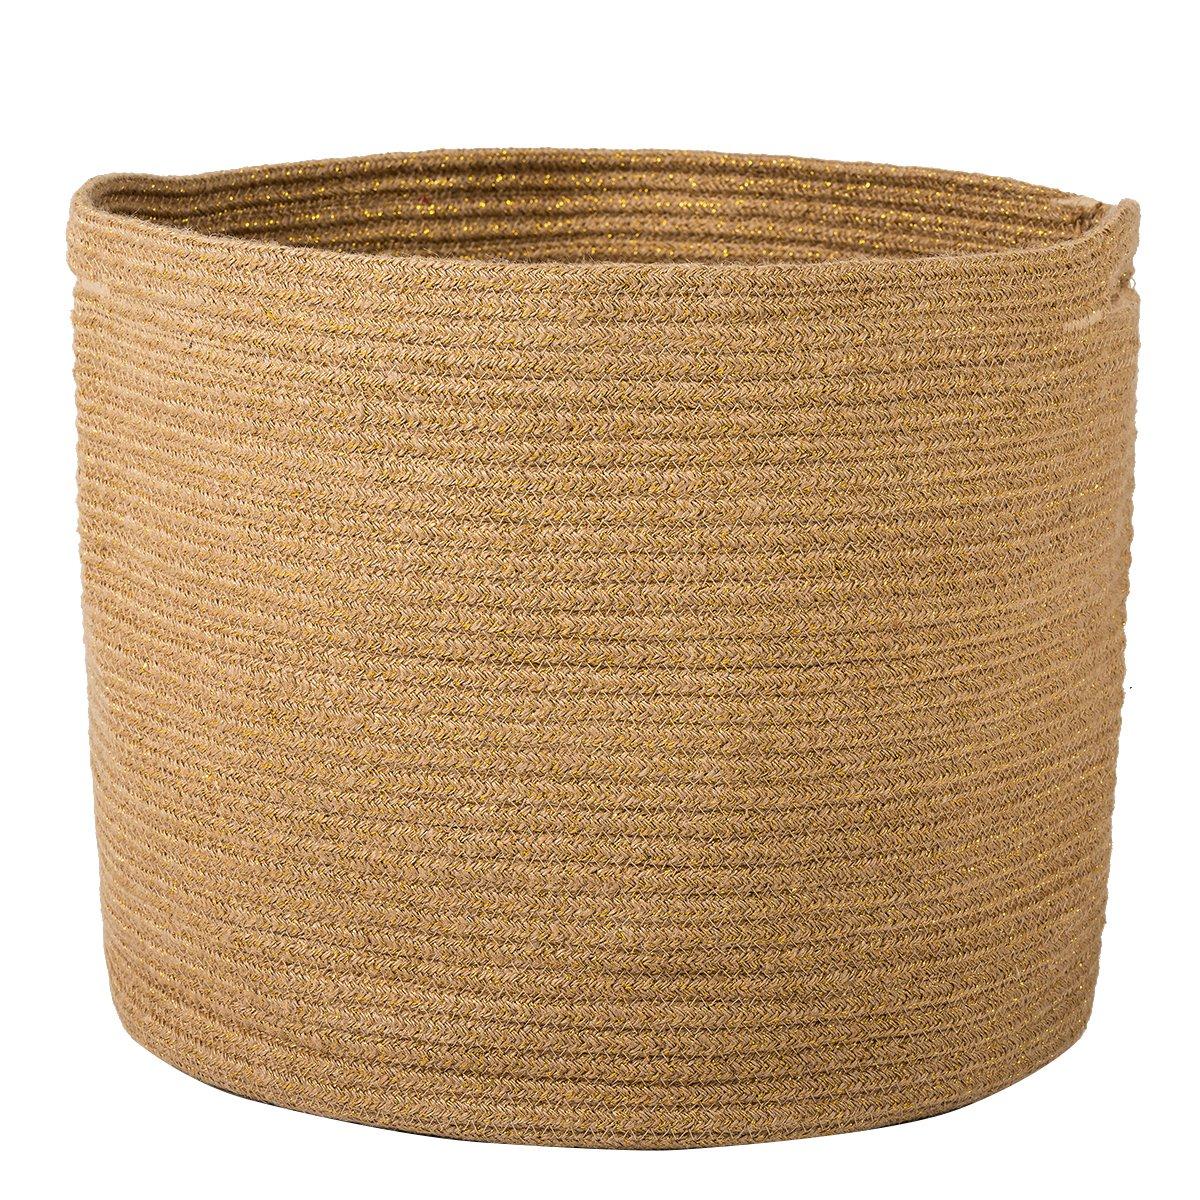 Goodpick Woven Storage Basket - Jute Basket - Rope Basket with Handles for Toys, Magazine, Books, Blanket, Logs, and Pot Plant Cover, Versatile Plant Holder Floor Laundry Storage Bin, 15.8''H x 12.6''D